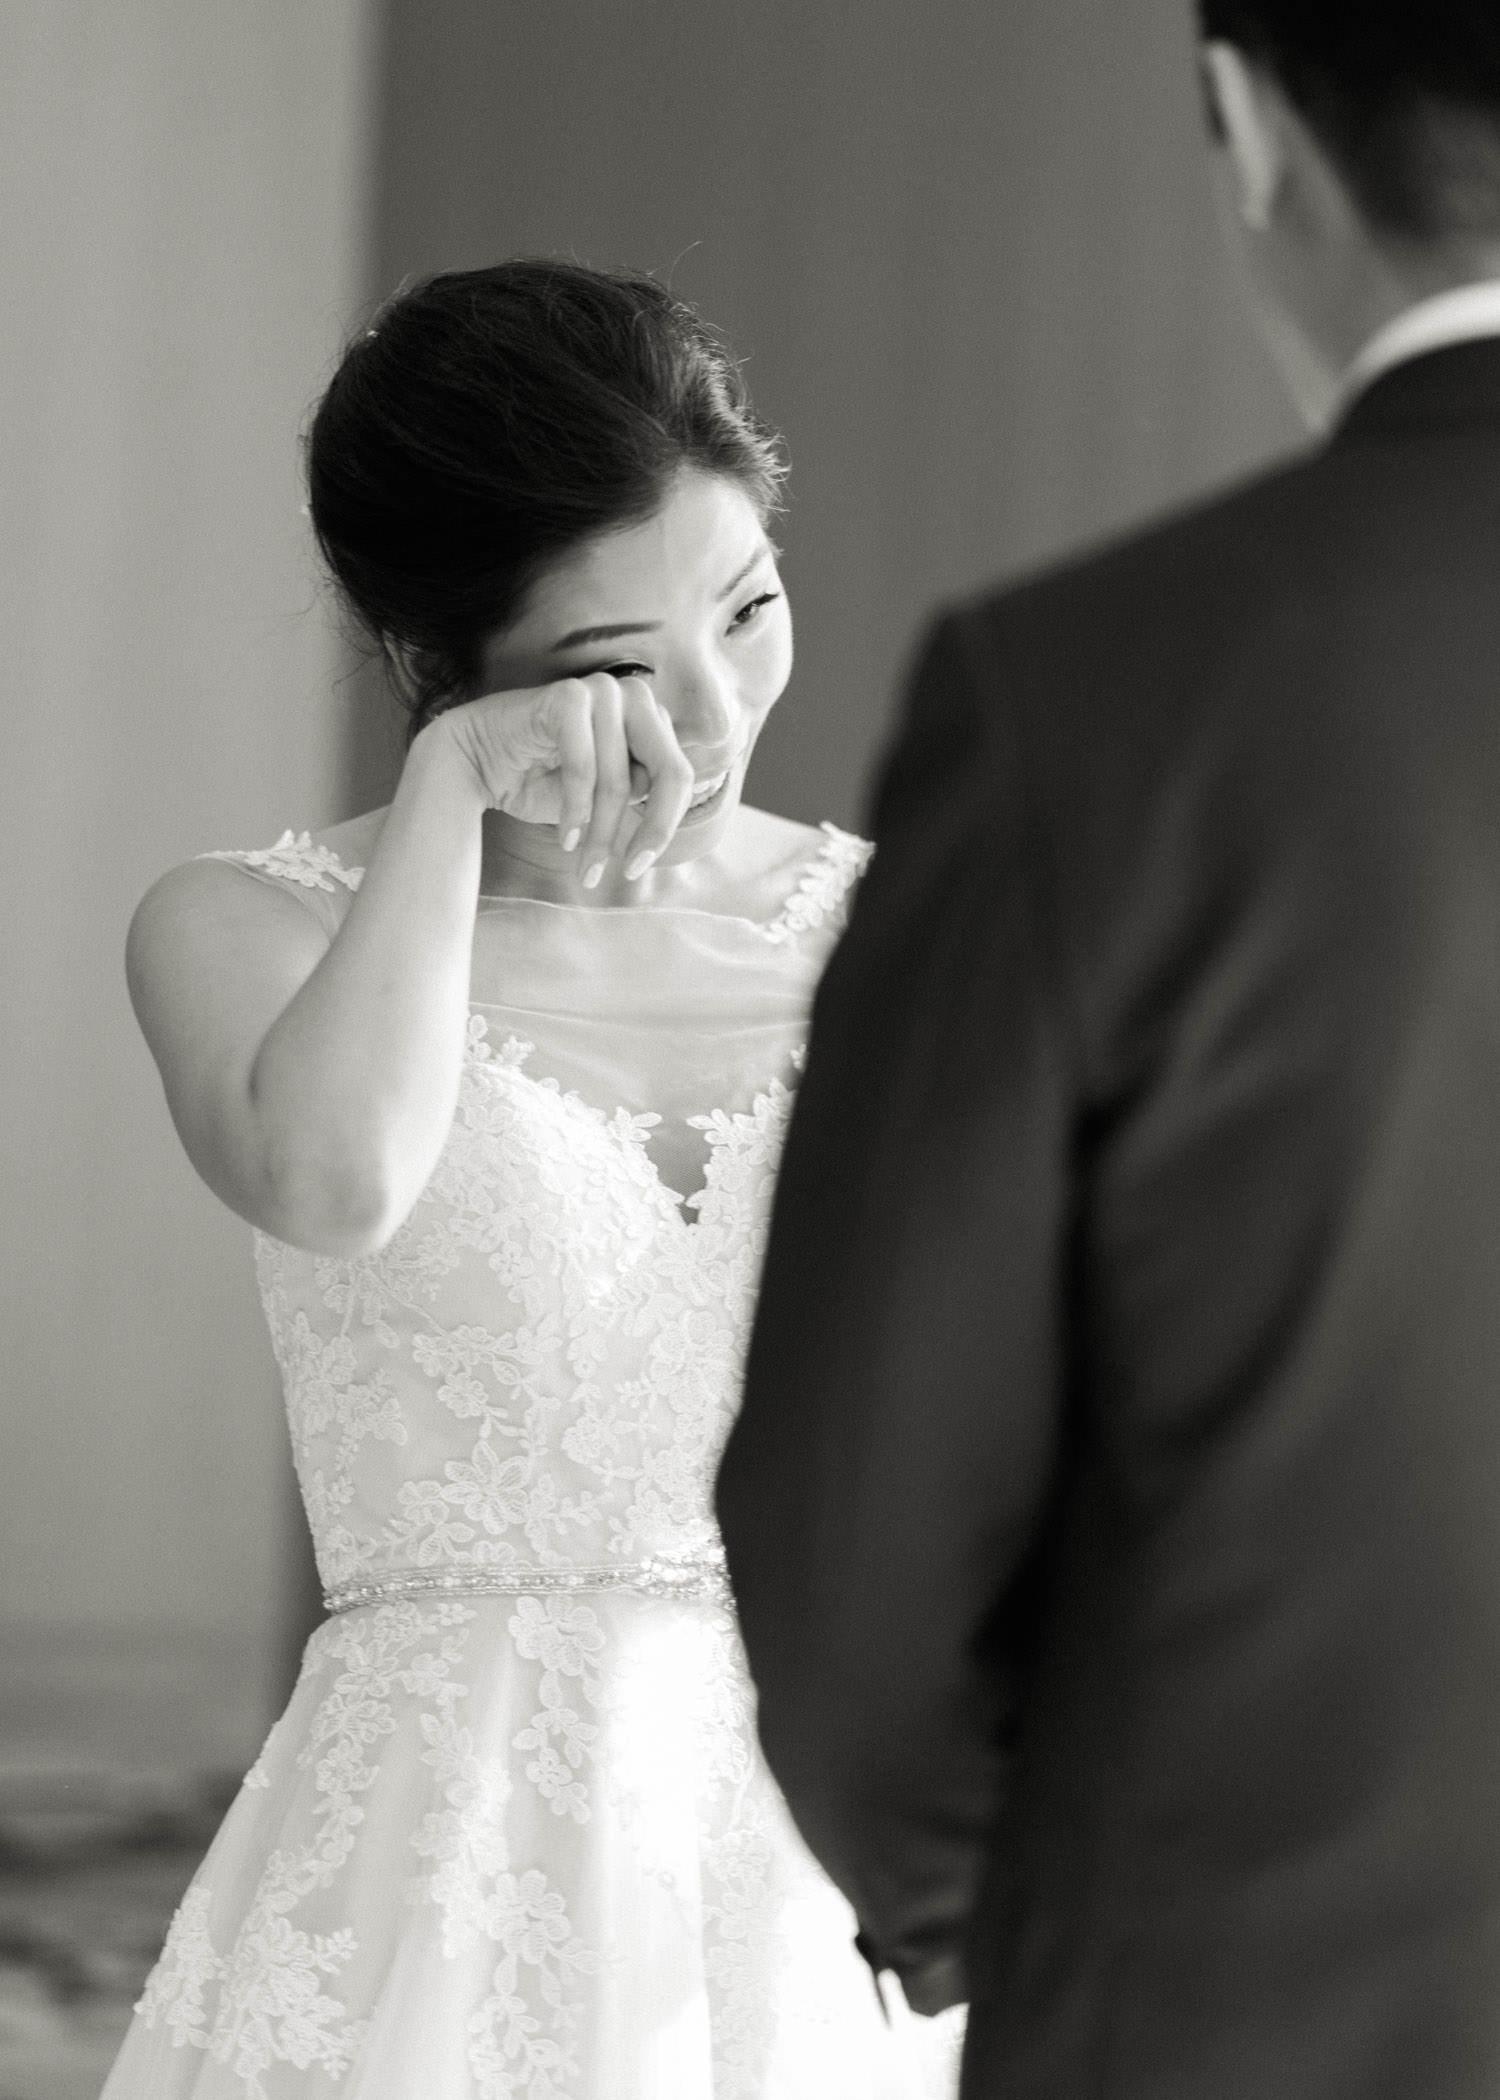 Bride cries during ceremony at Shangri-La hotel in Toronto wedding